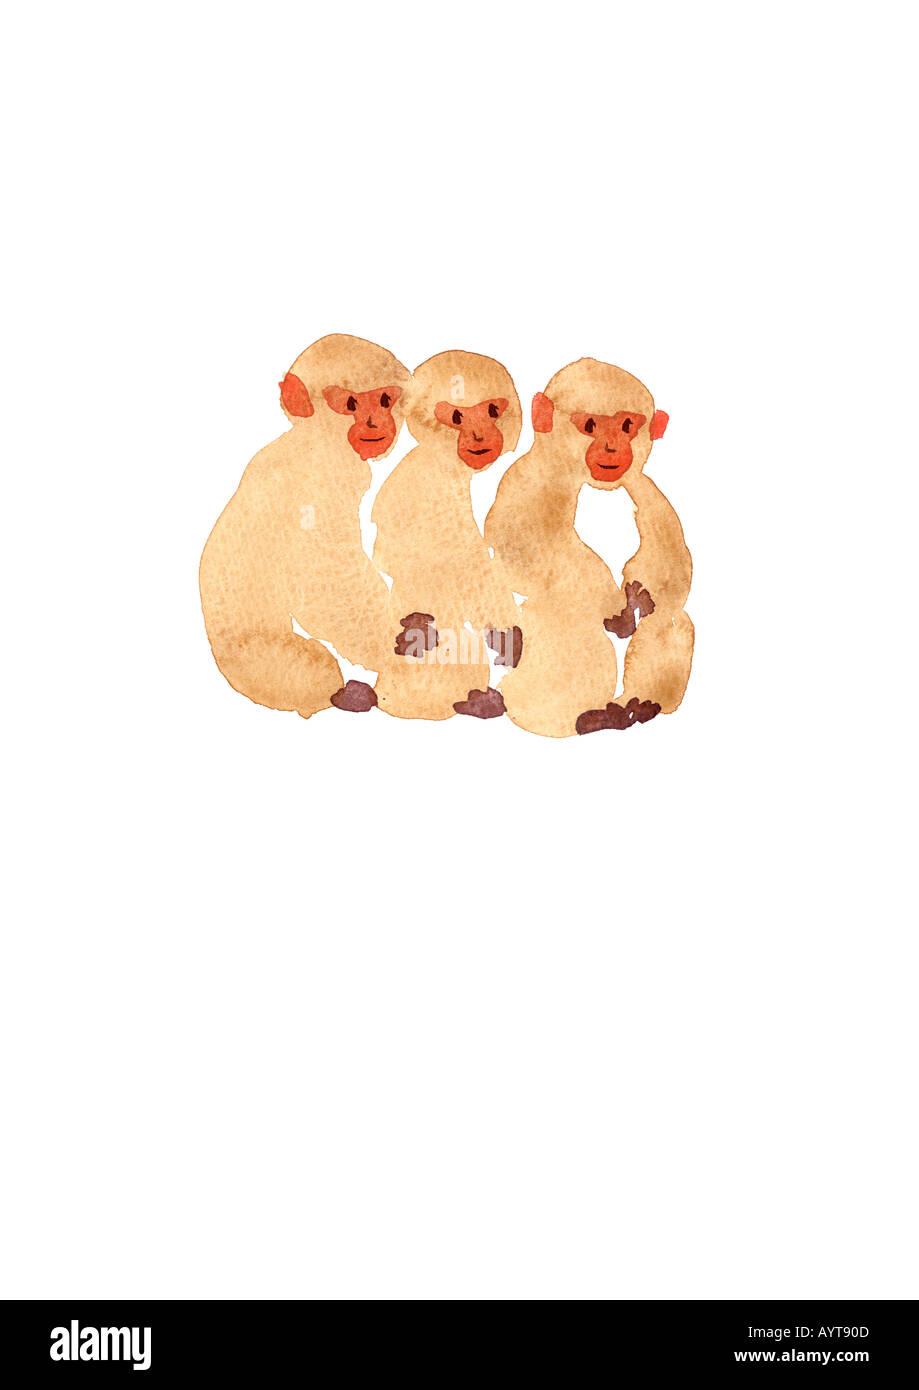 Hatice aslan uc maymun - 1 2